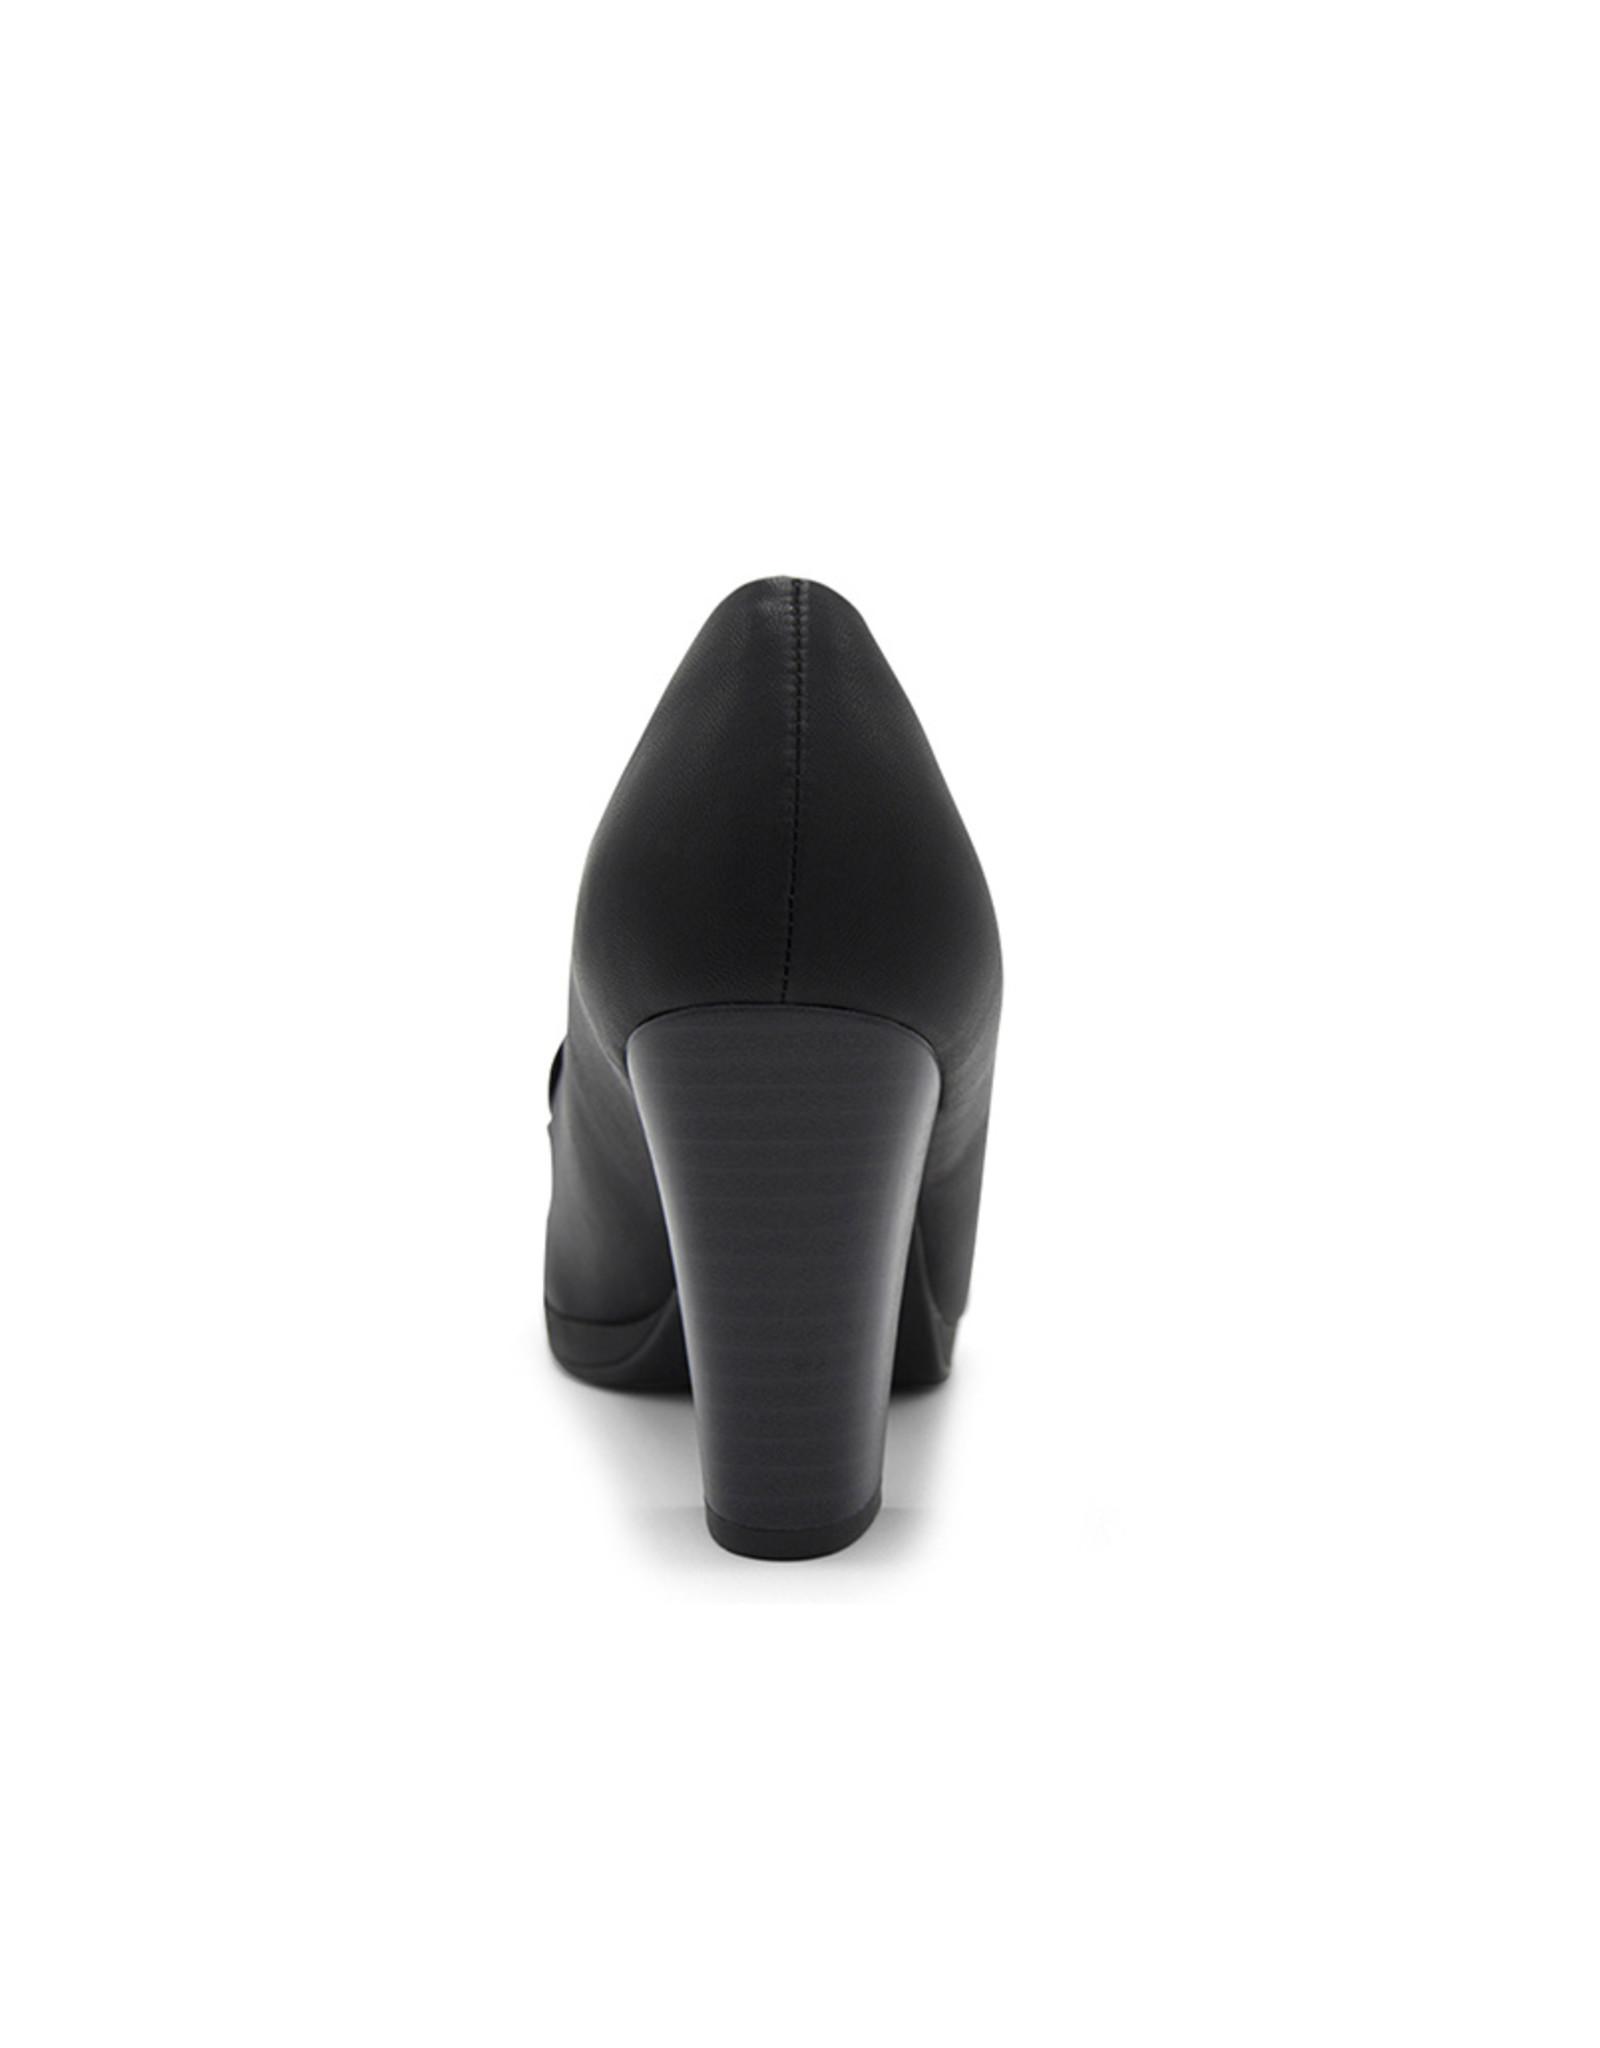 Piccadilly  schoenen Perth met hoge wreef